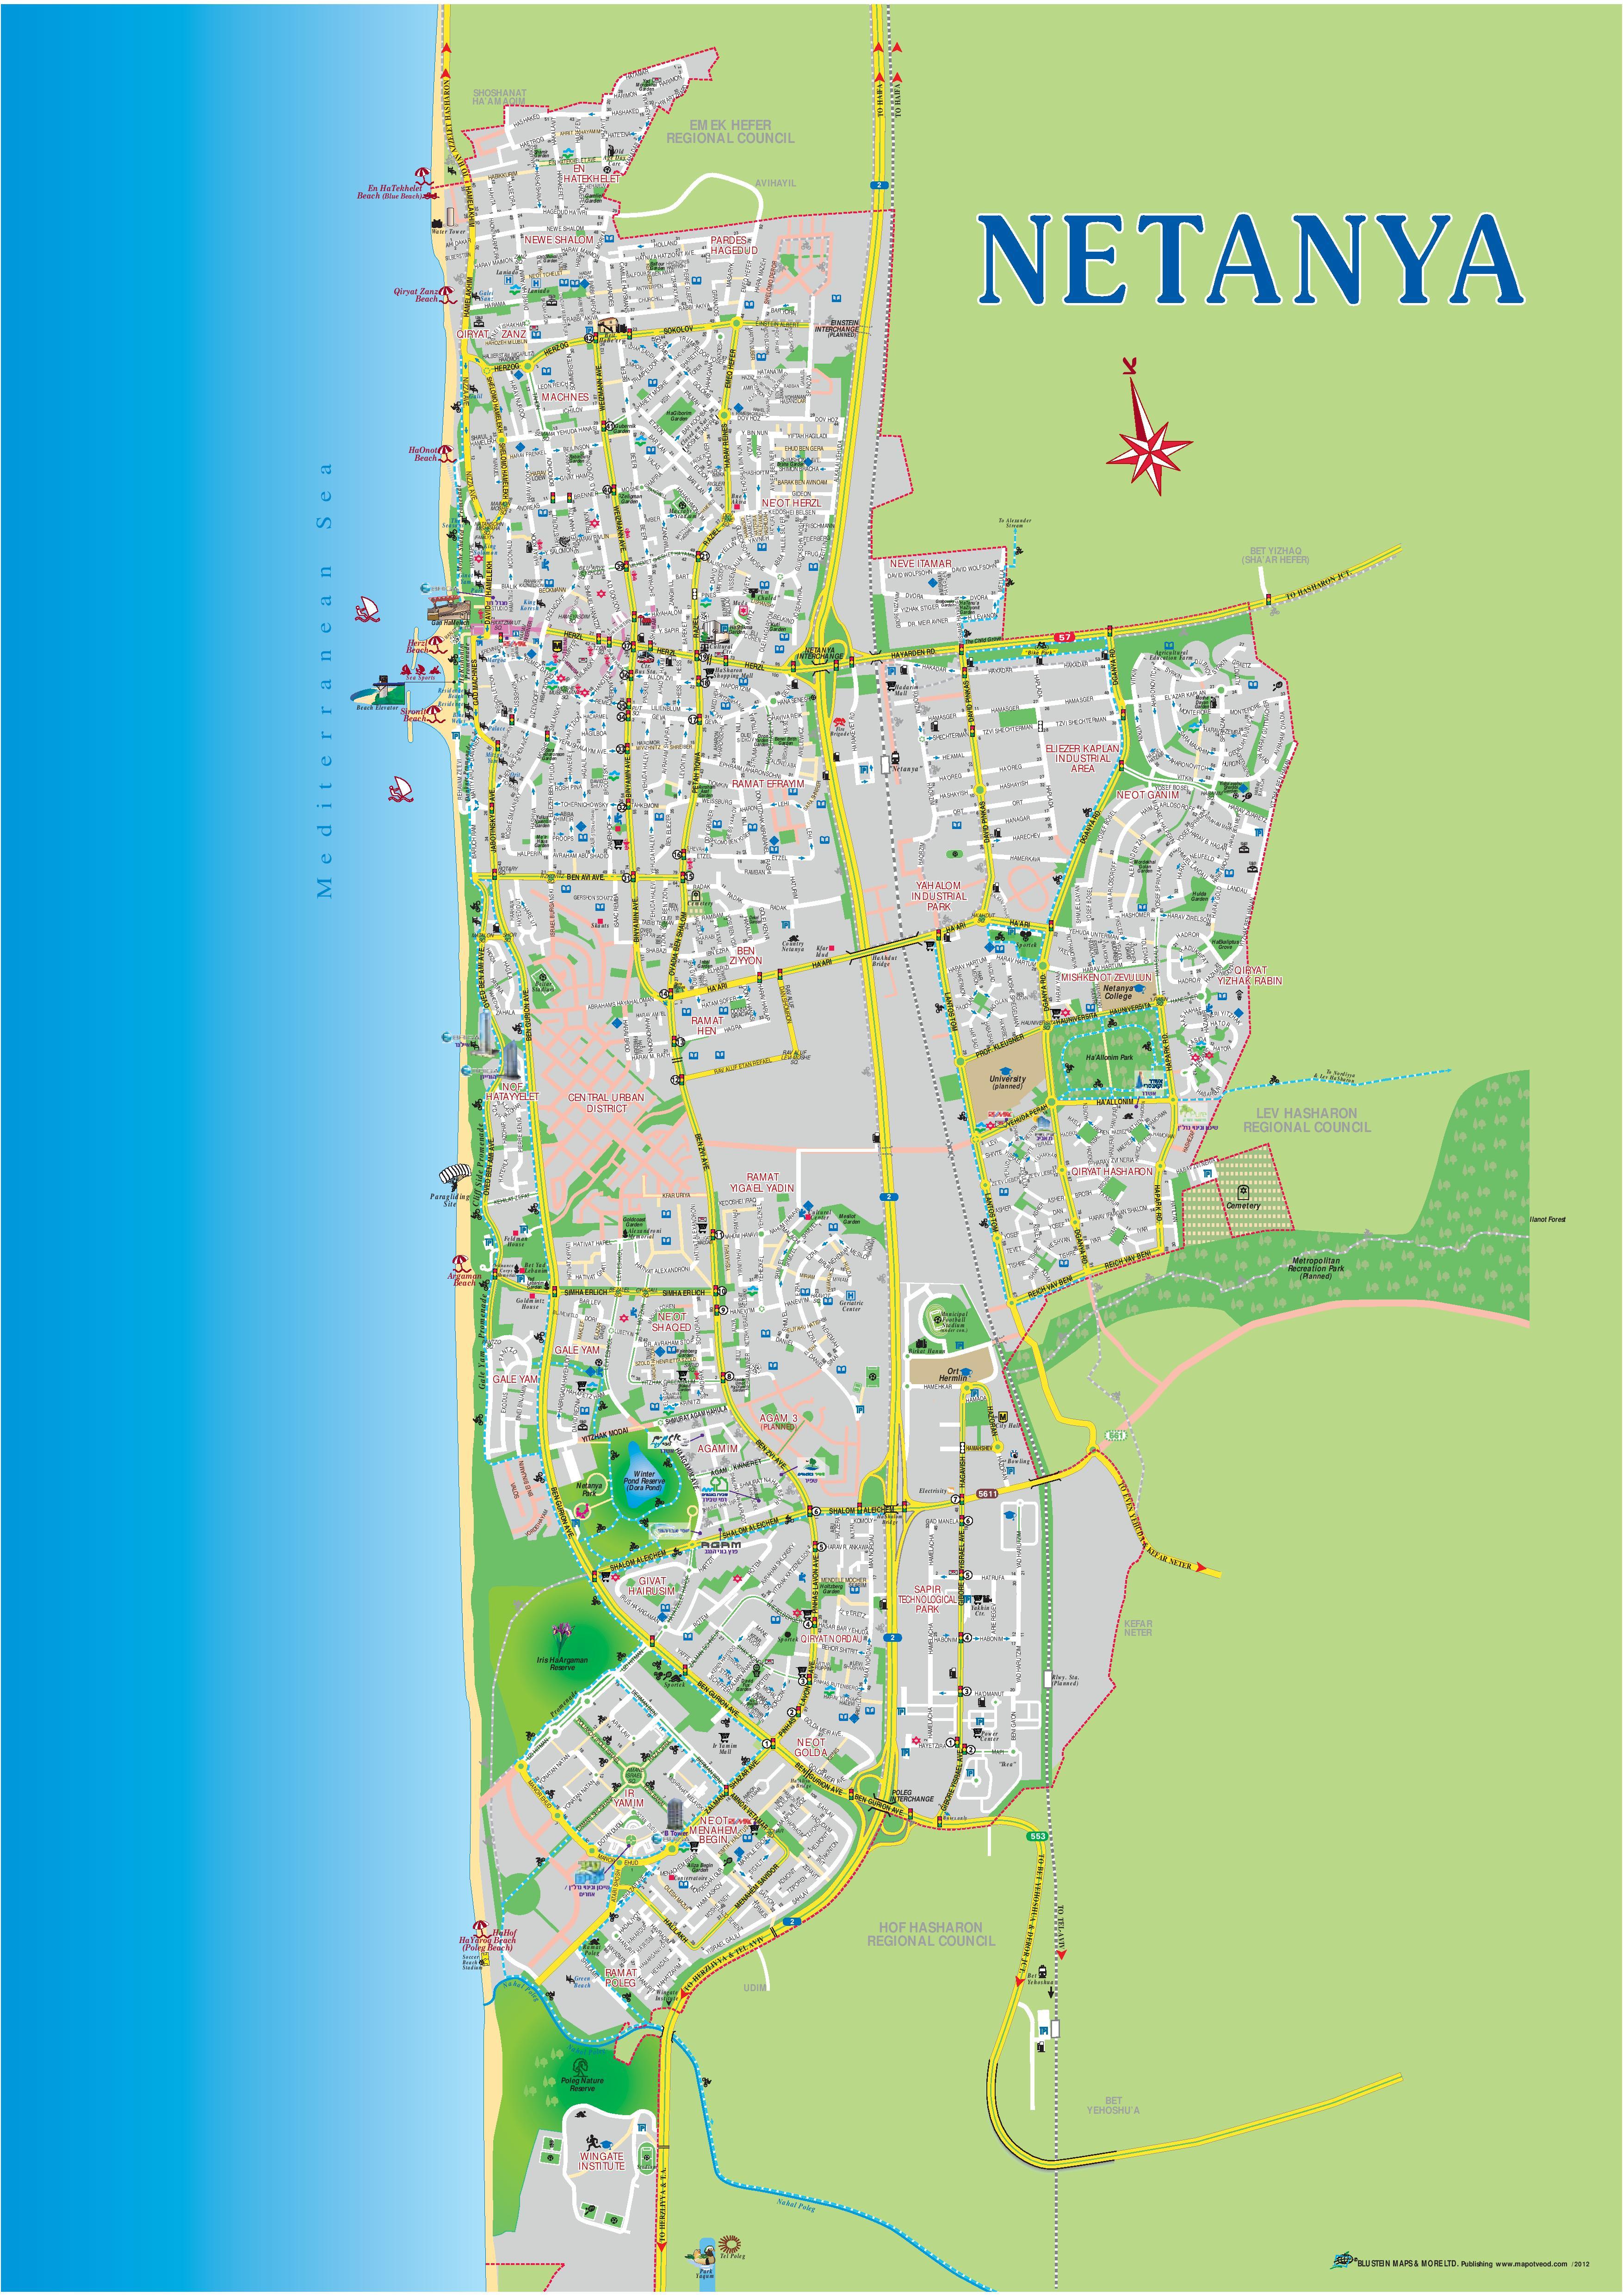 Netanya tourist map